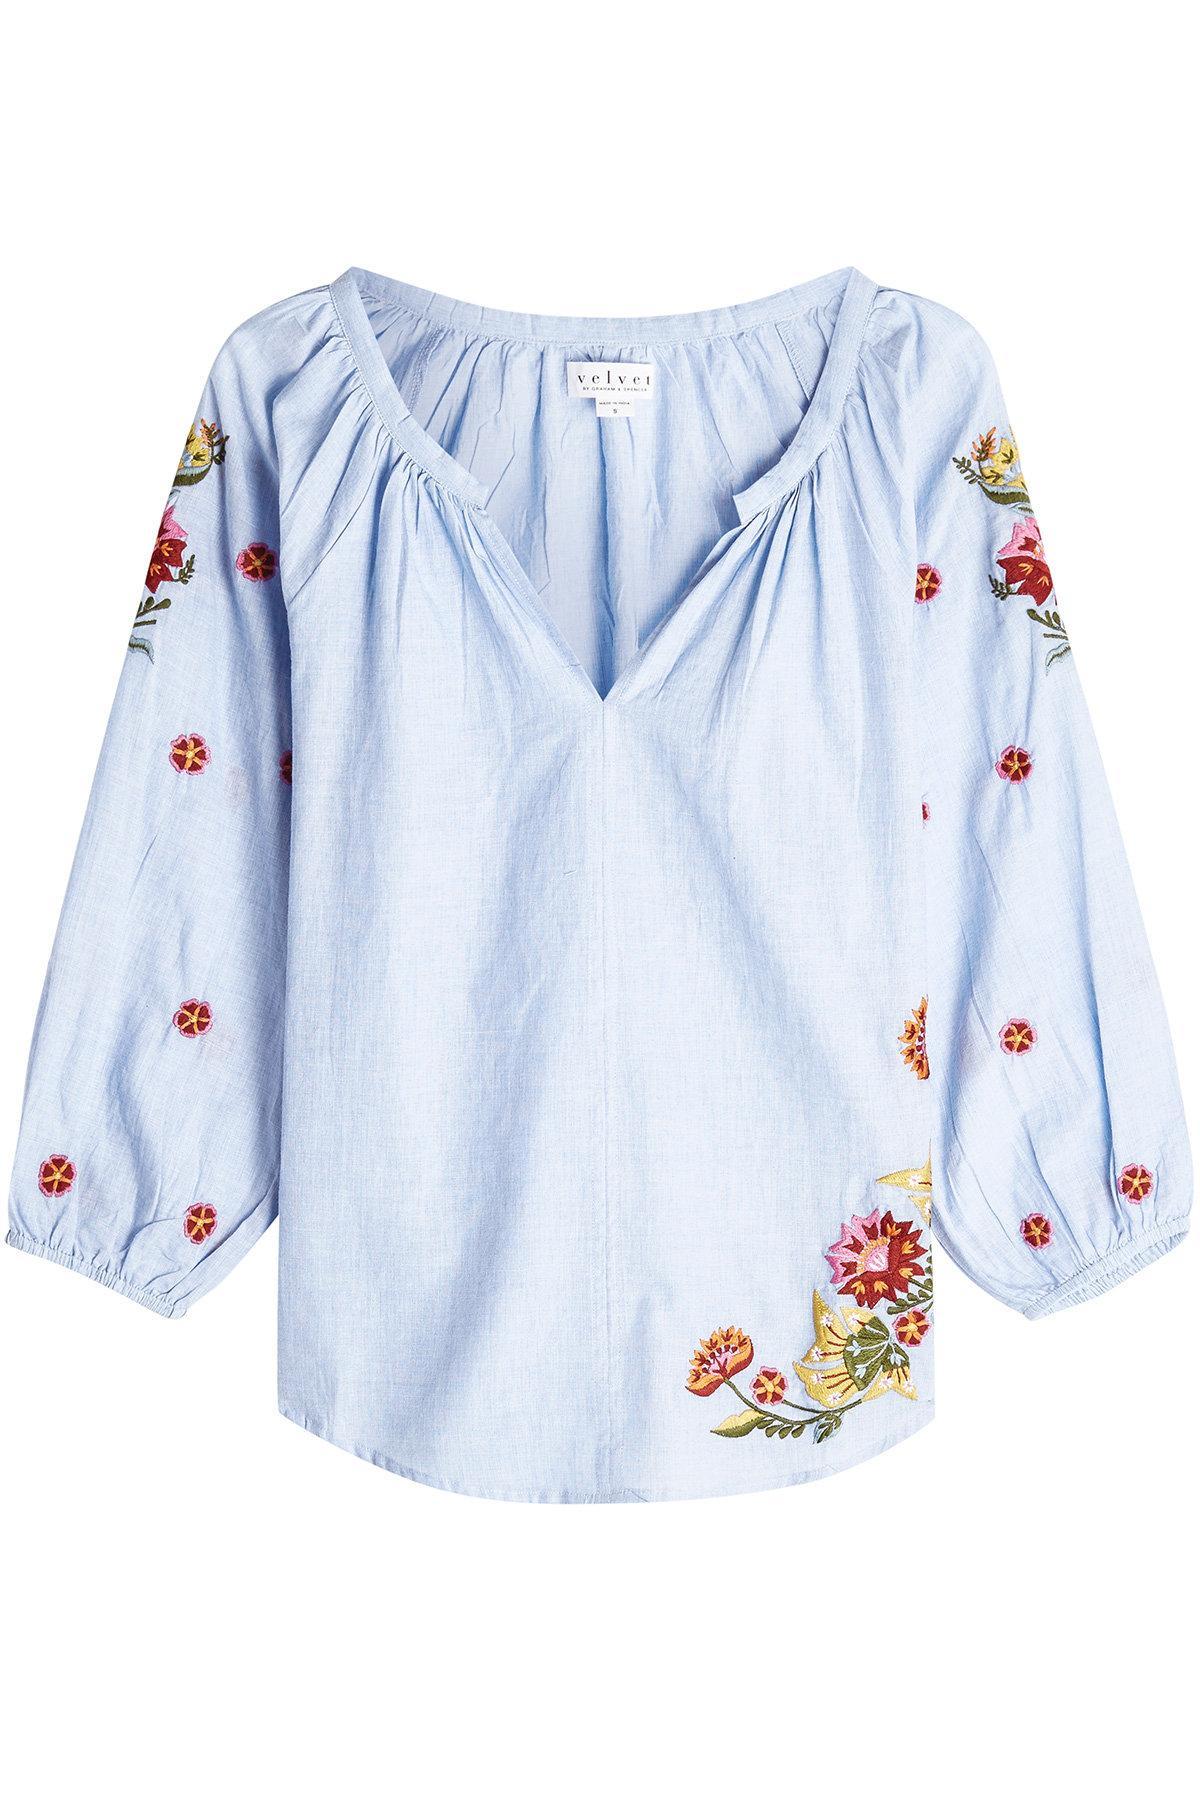 Velvet Arabelle Embroidered Cotton Blouse In Multicolored